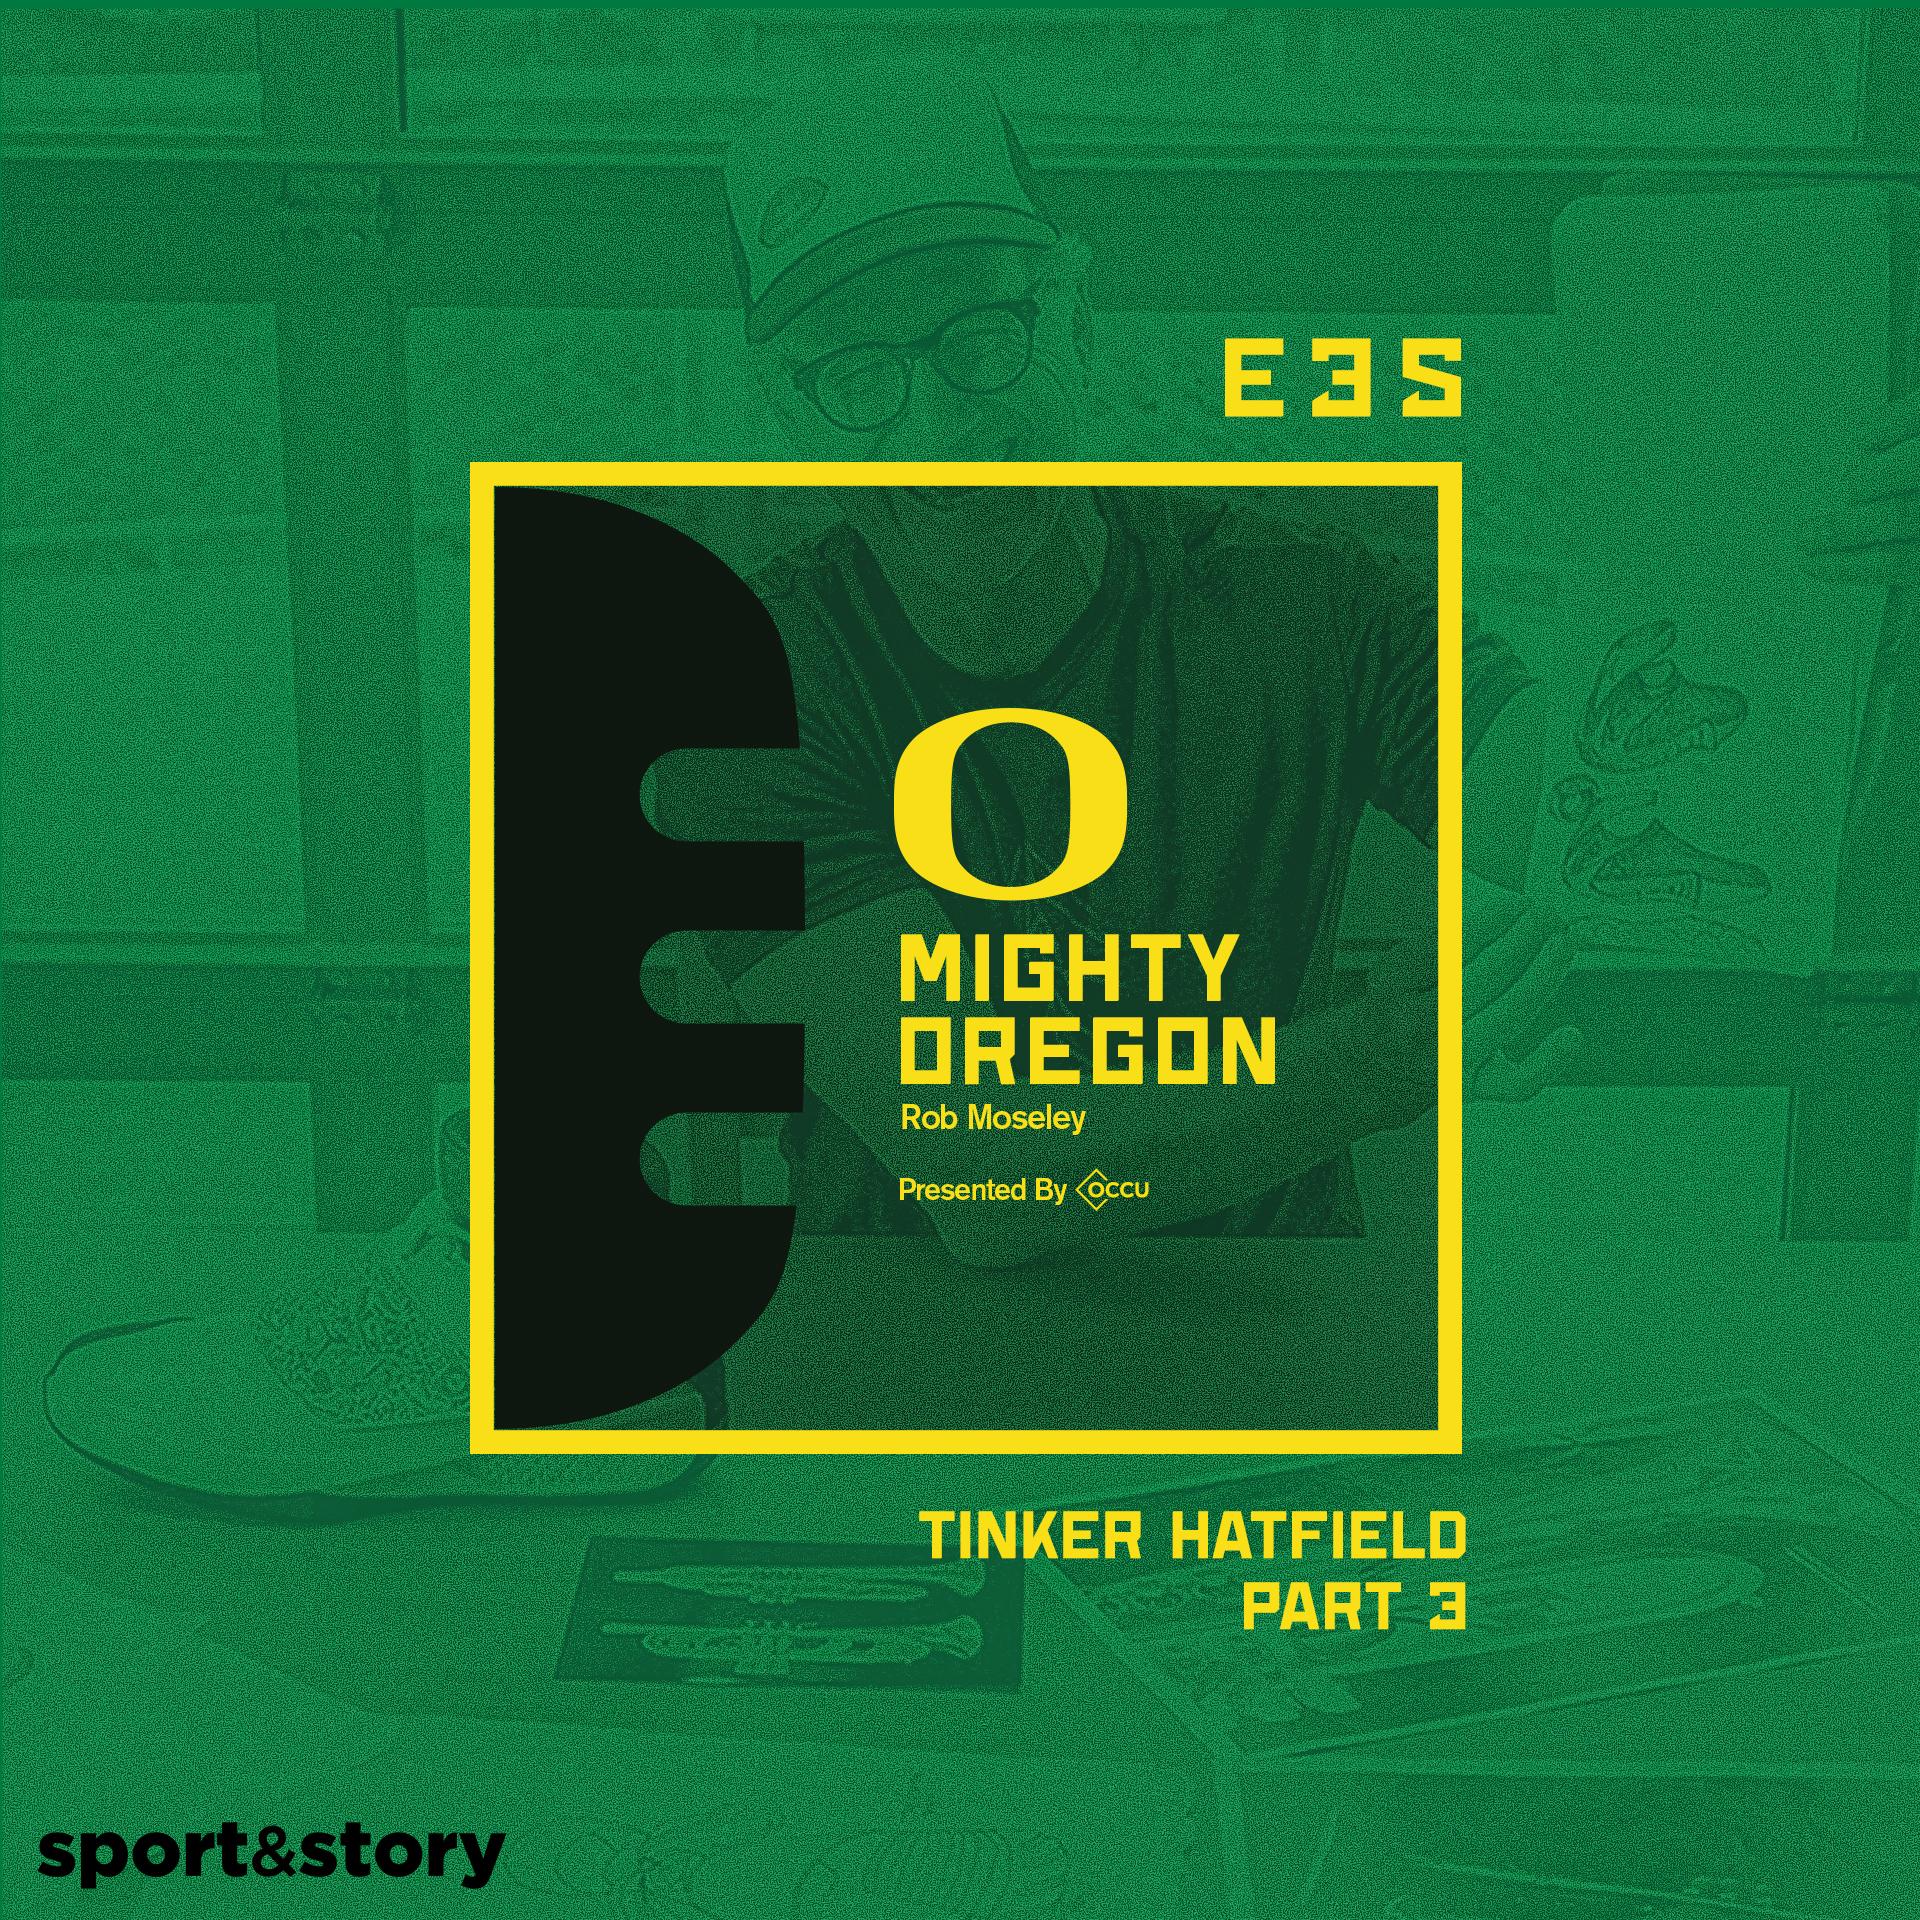 35. Tinker Hatfield (Part Three): Cracking The Code